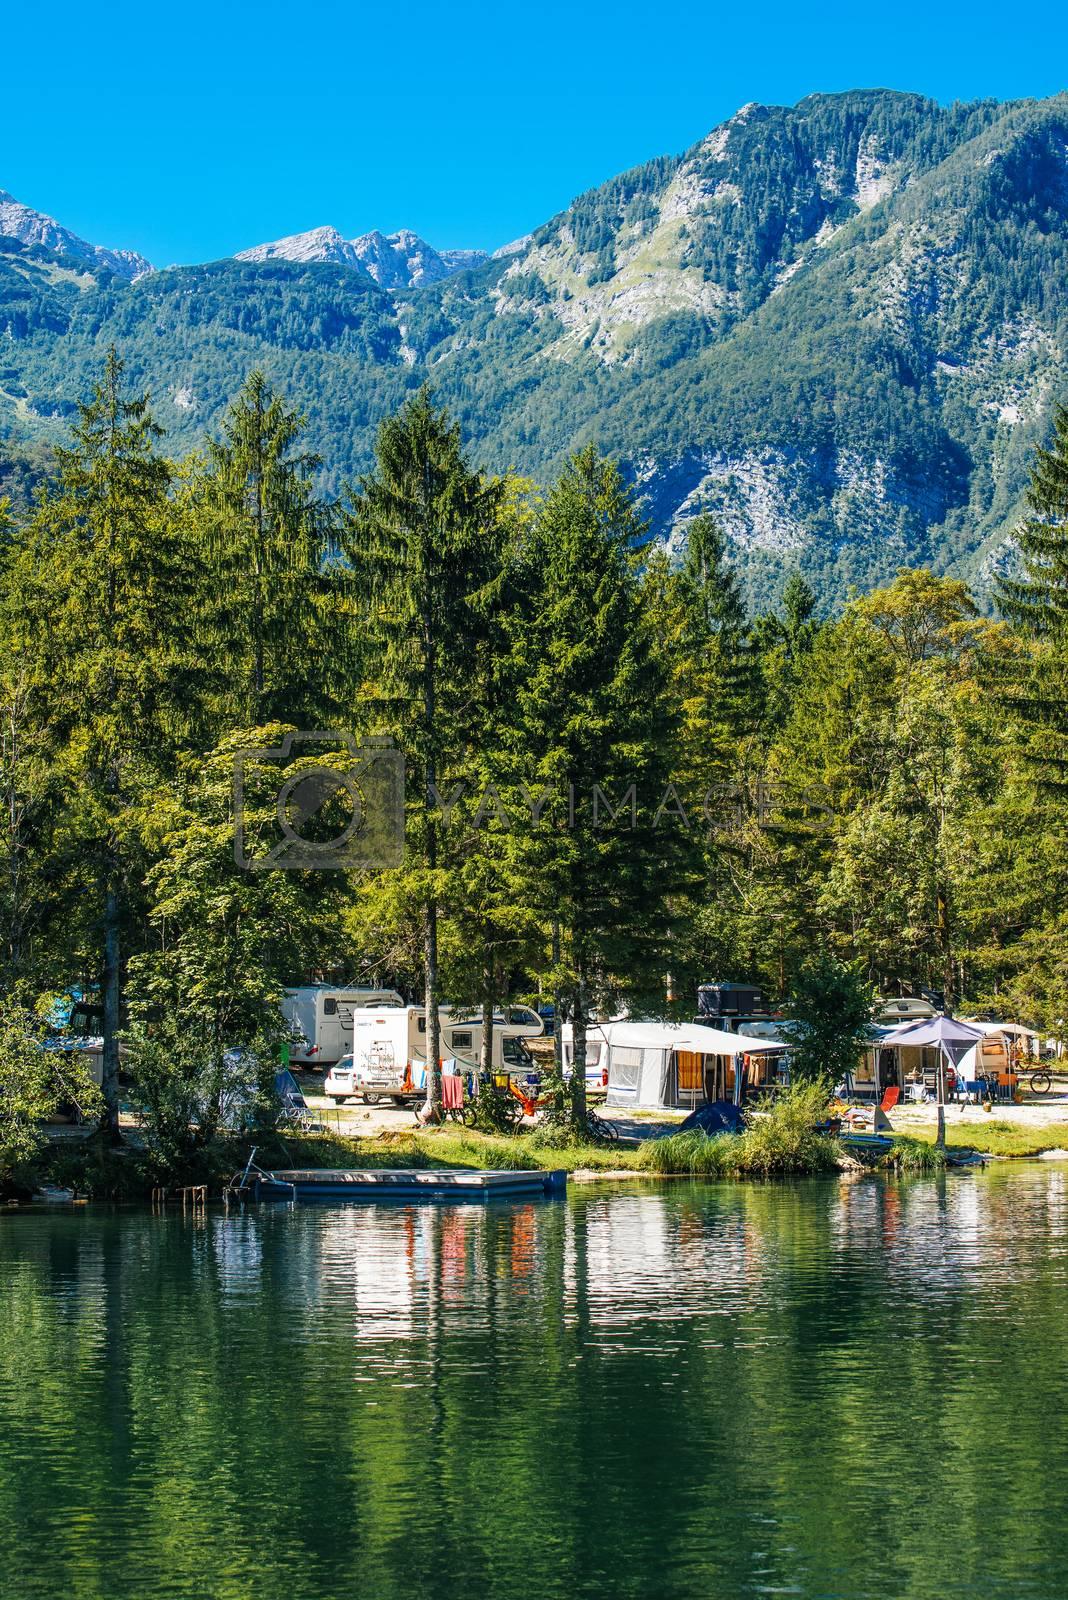 Ukanc camping site on Bohinj lake, Slovenia by stevanovicigor